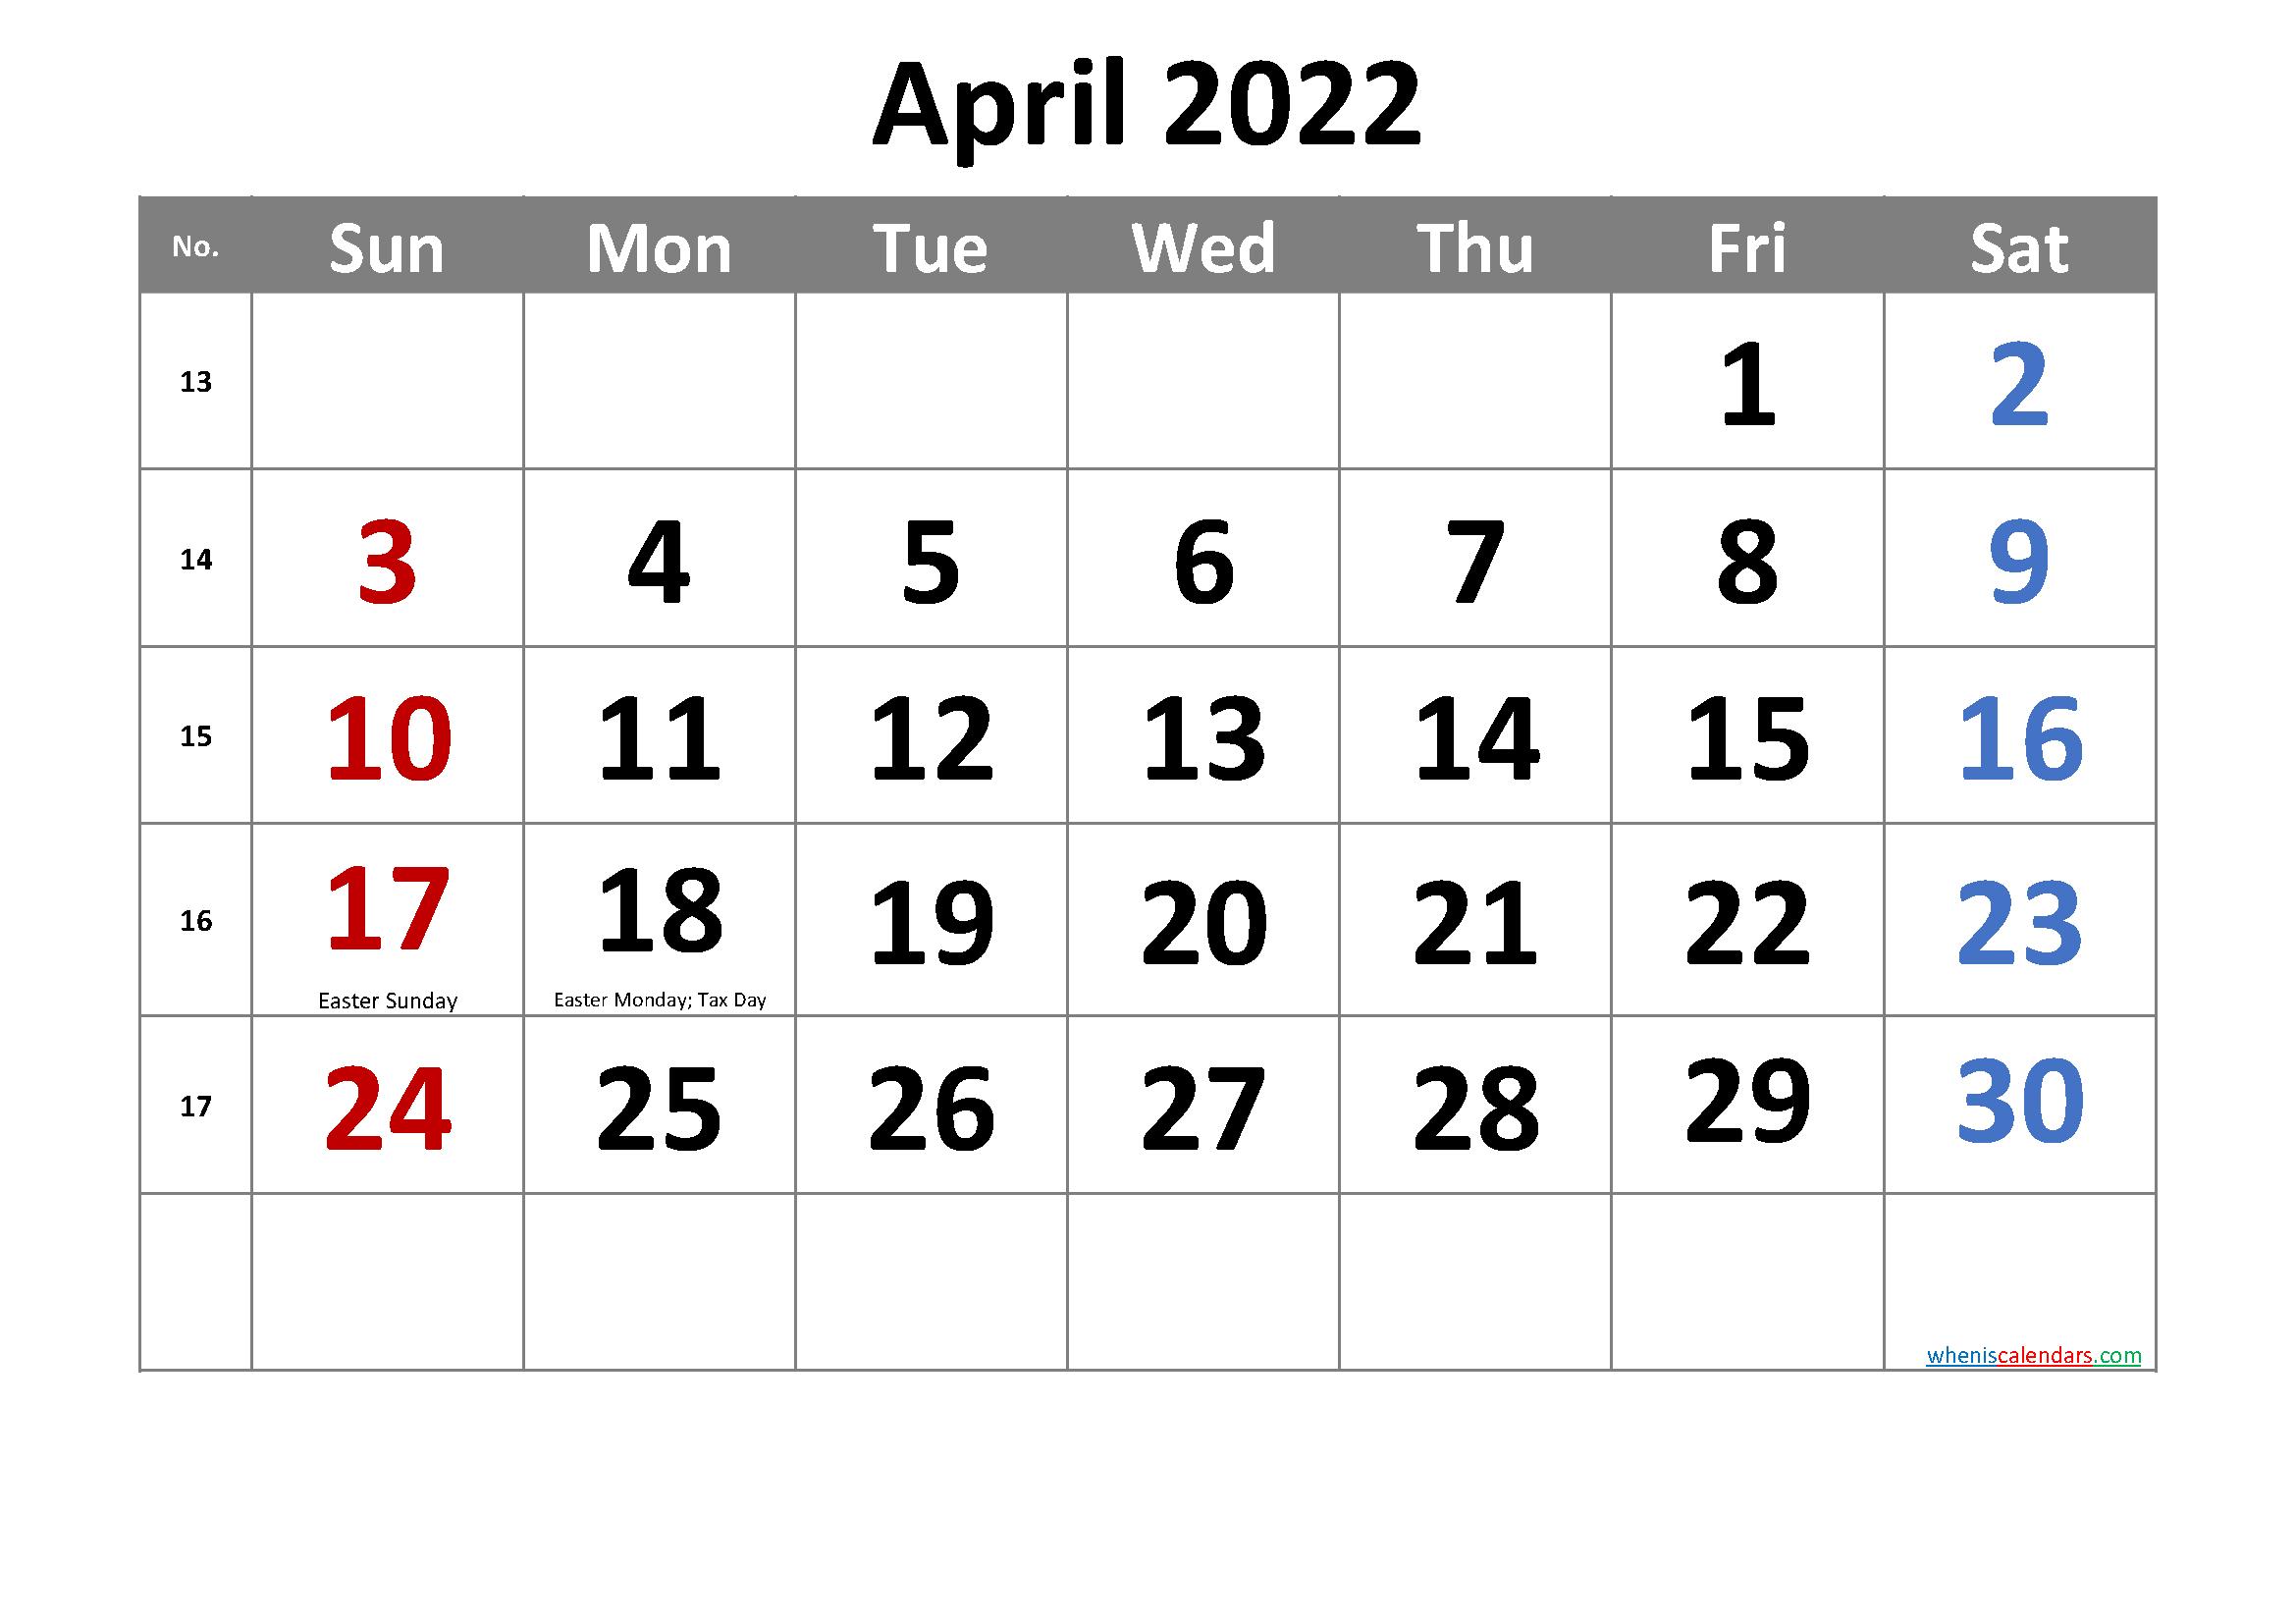 Free April 2022 Calendar Printable within Printable April 2022 Calendar Graphics